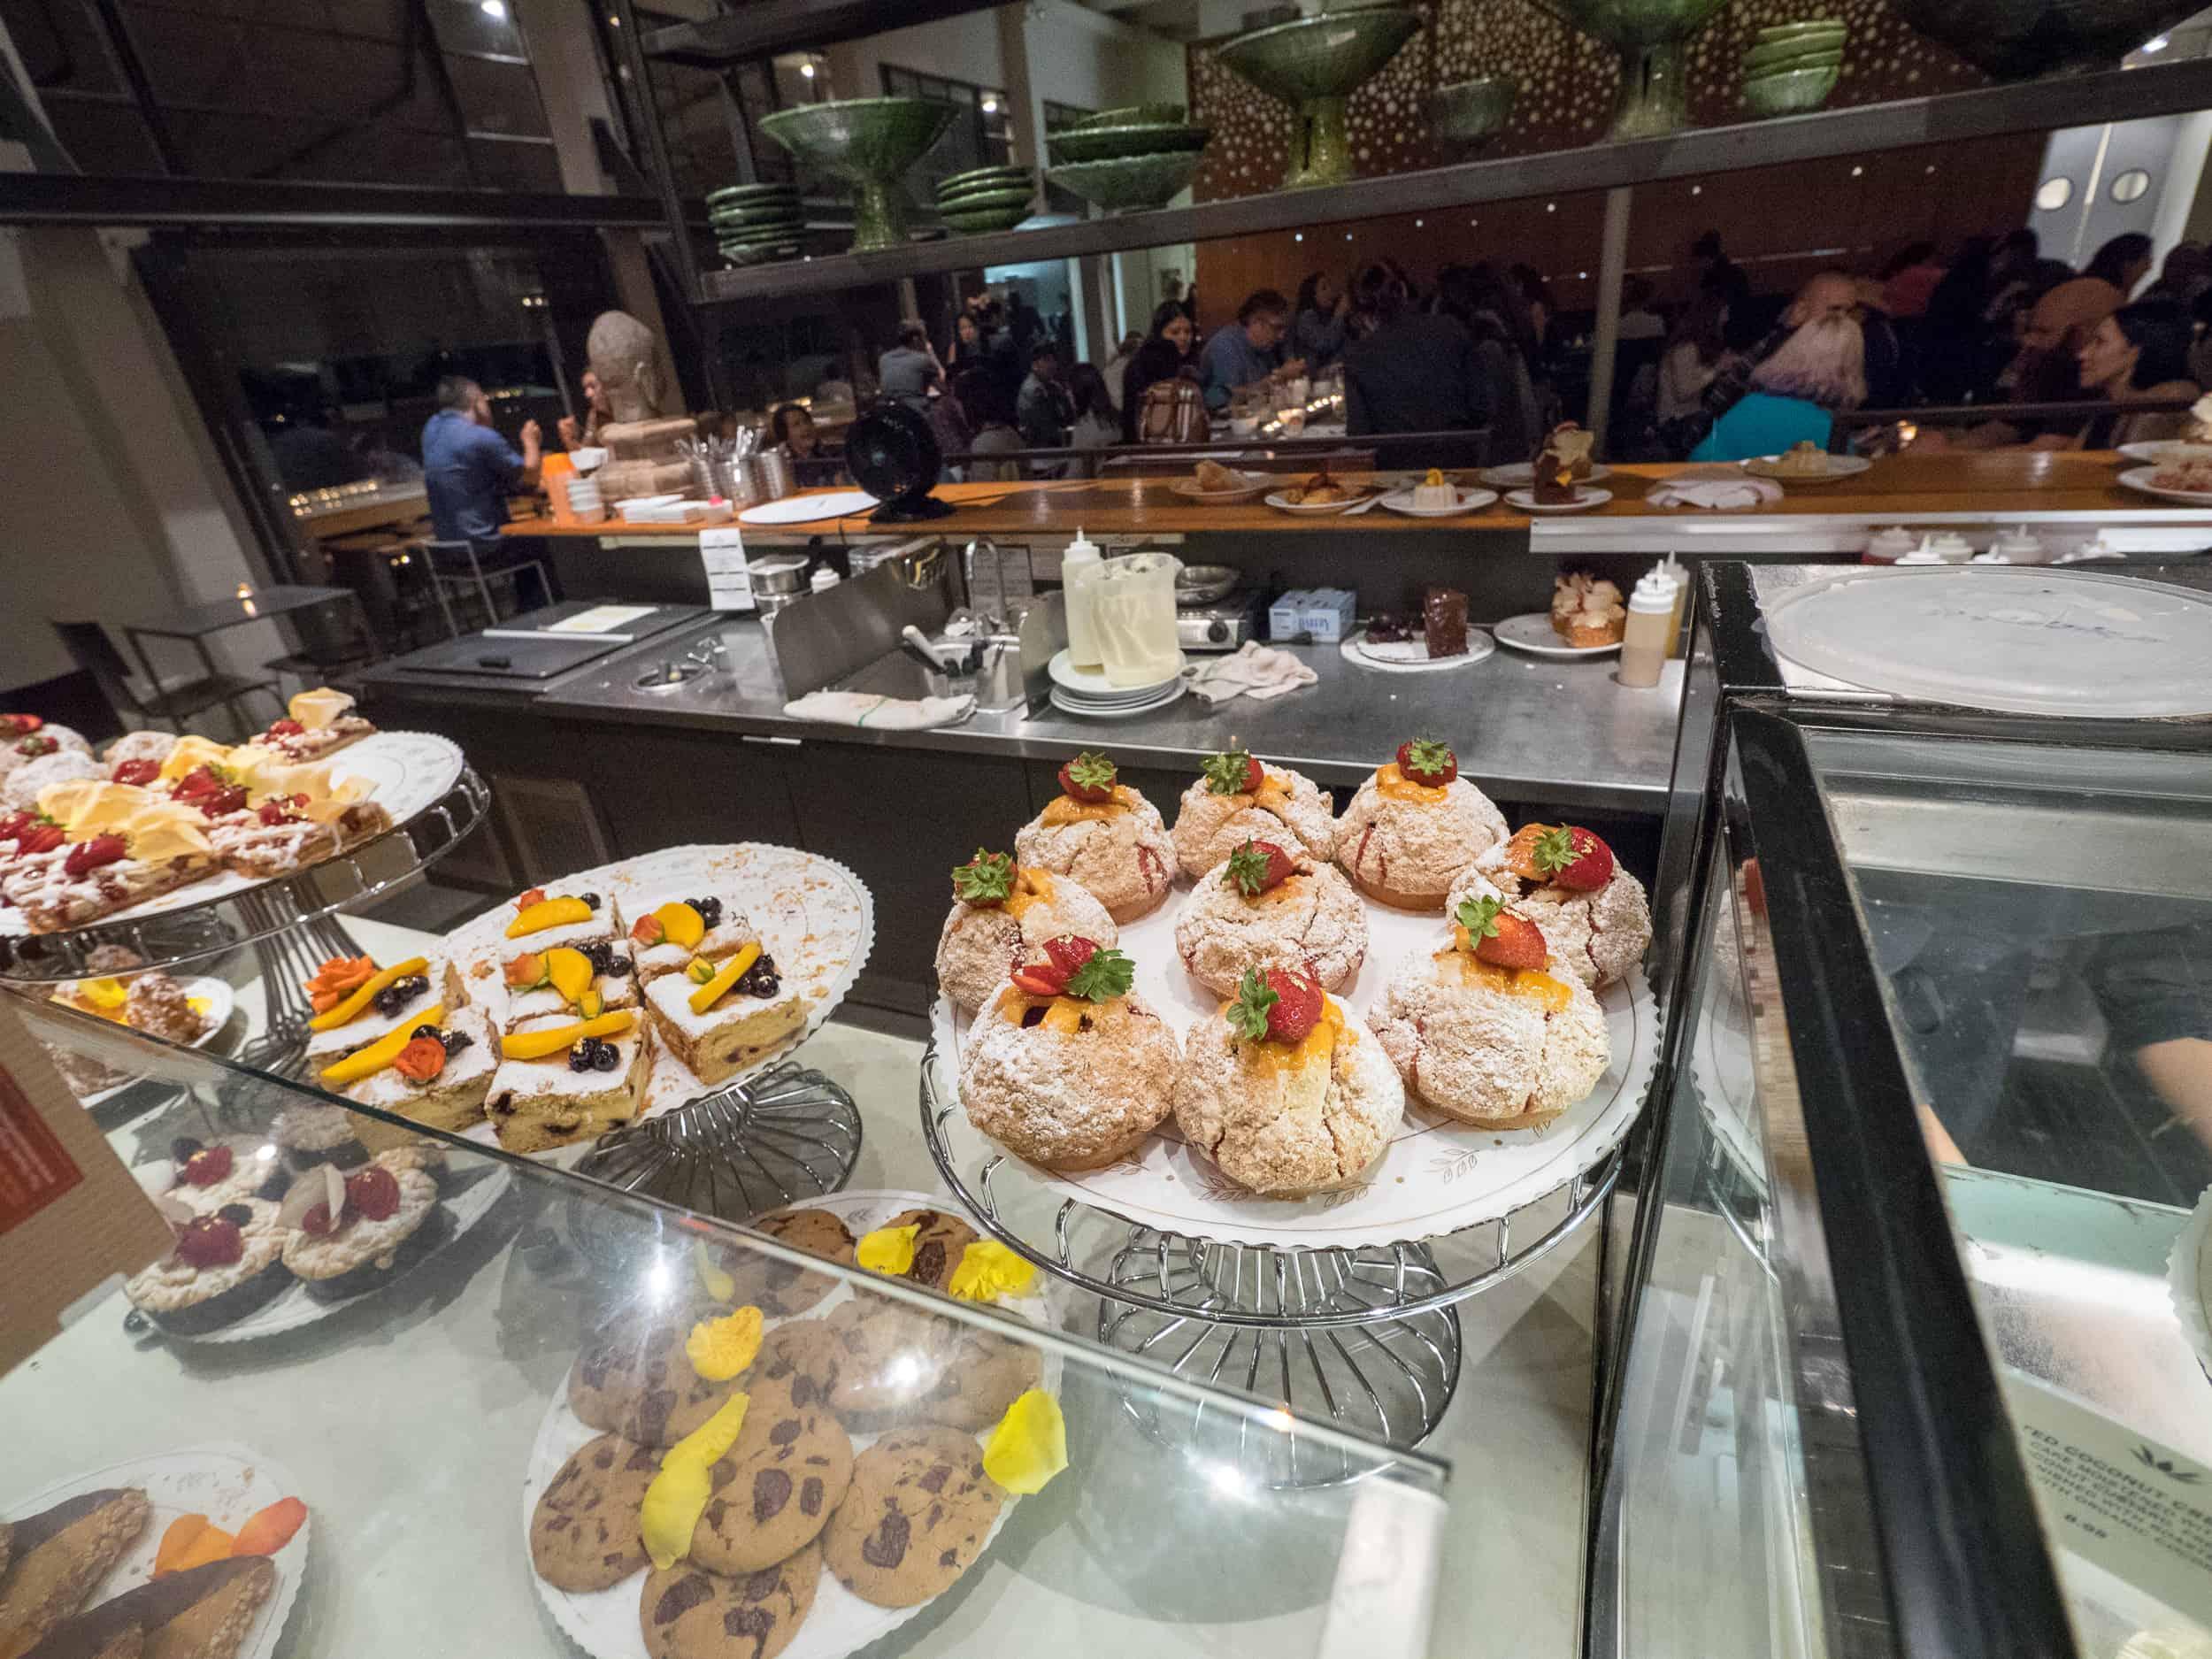 Extraordinary Desserts Union St P6050142